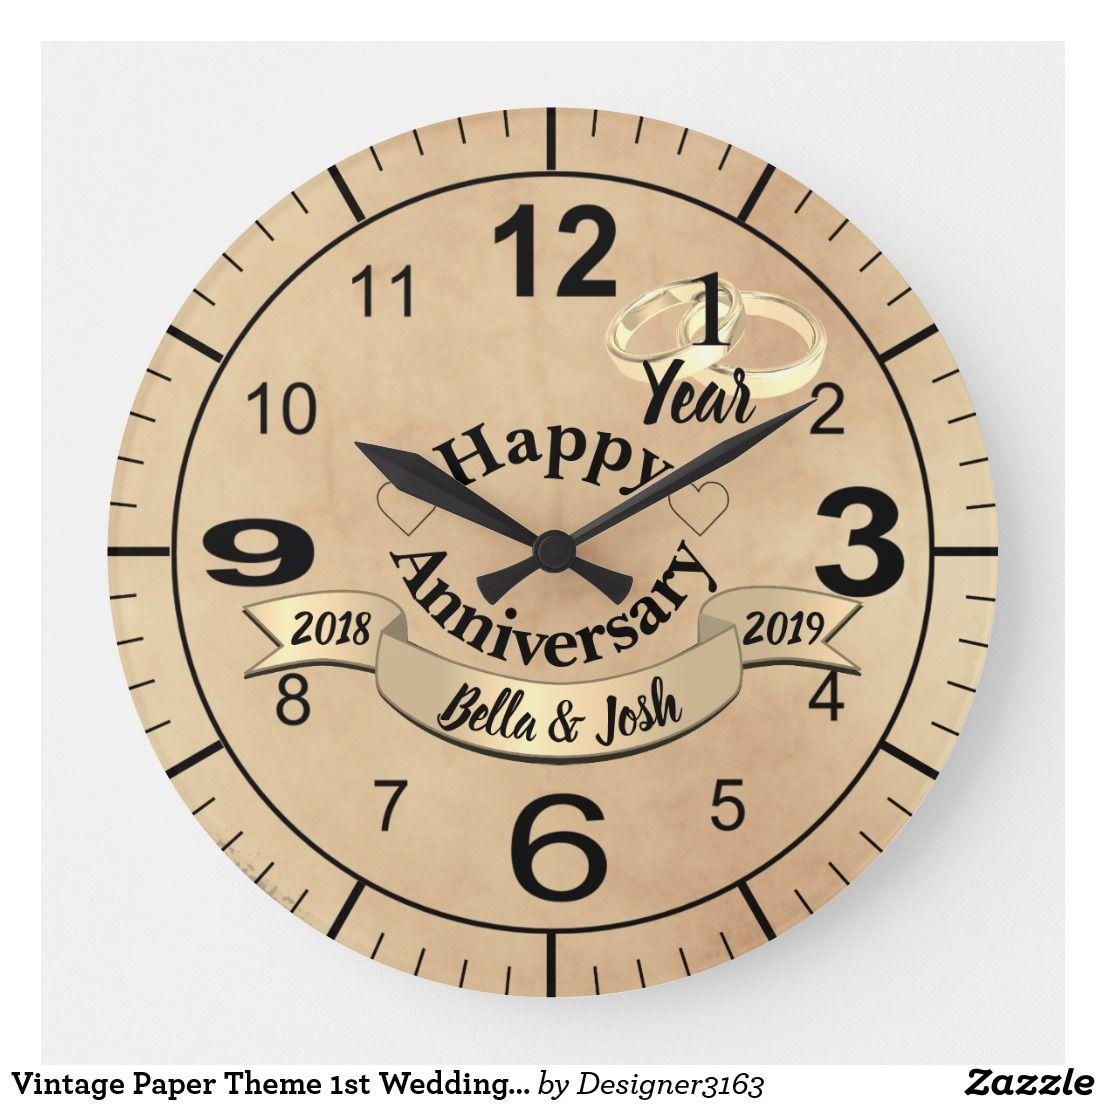 Vintage Paper Theme 1st Wedding Anniversary Clock Zazzle Com Anniversary Clock First Wedding Anniversary Gift 1st Wedding Anniversary